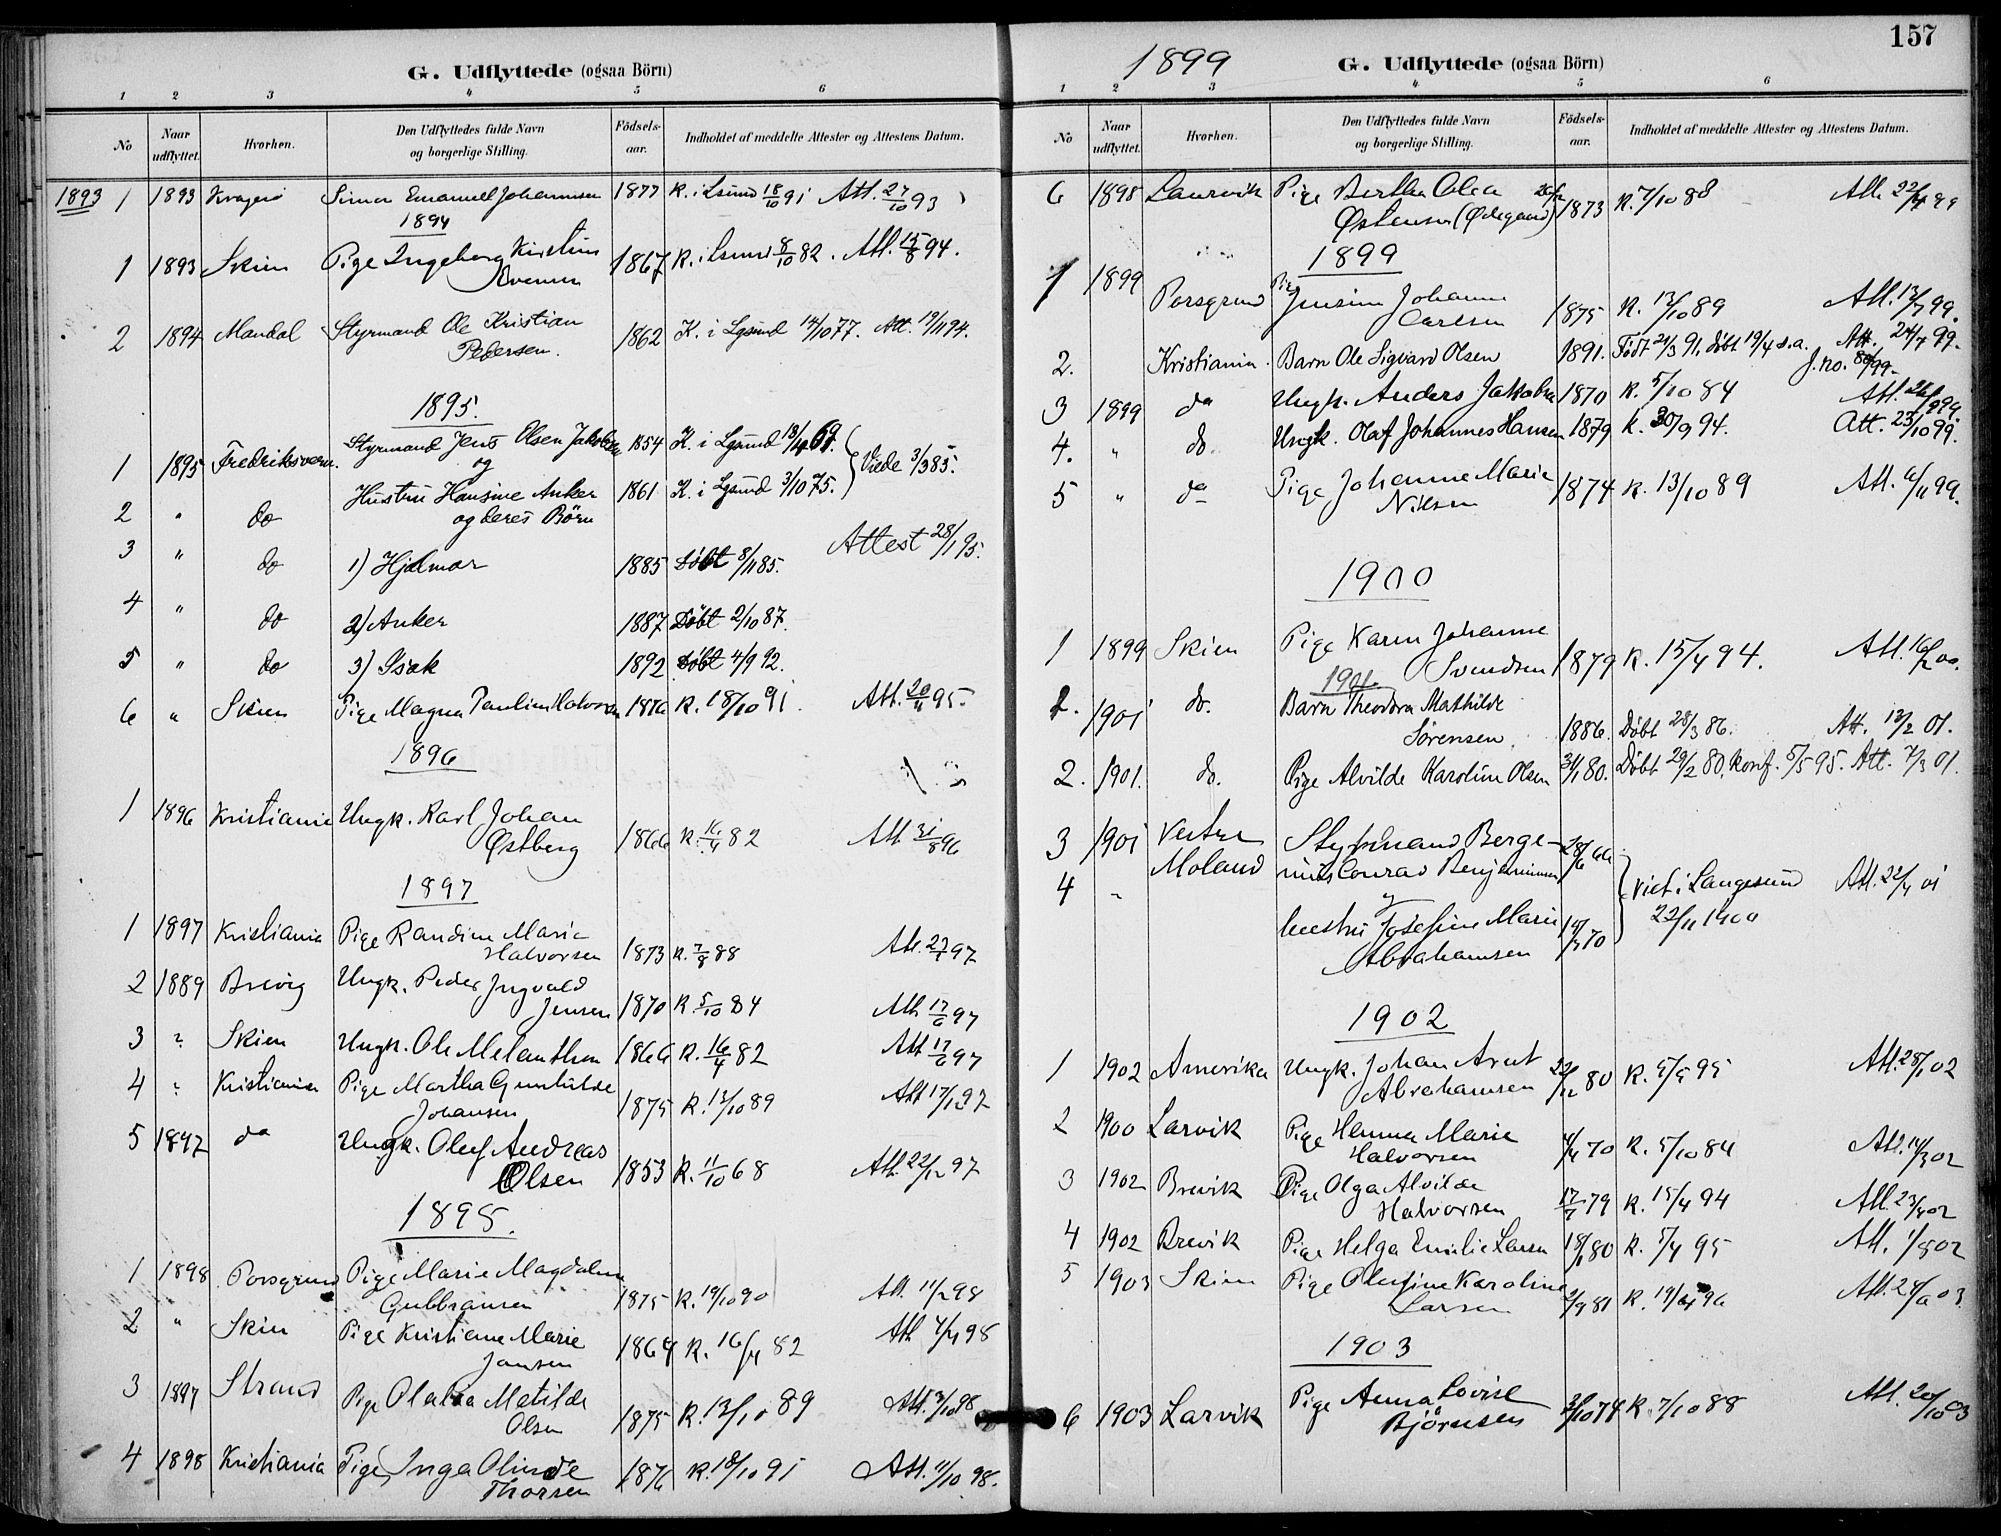 SAKO, Langesund kirkebøker, F/Fa/L0003: Ministerialbok nr. 3, 1893-1907, s. 157